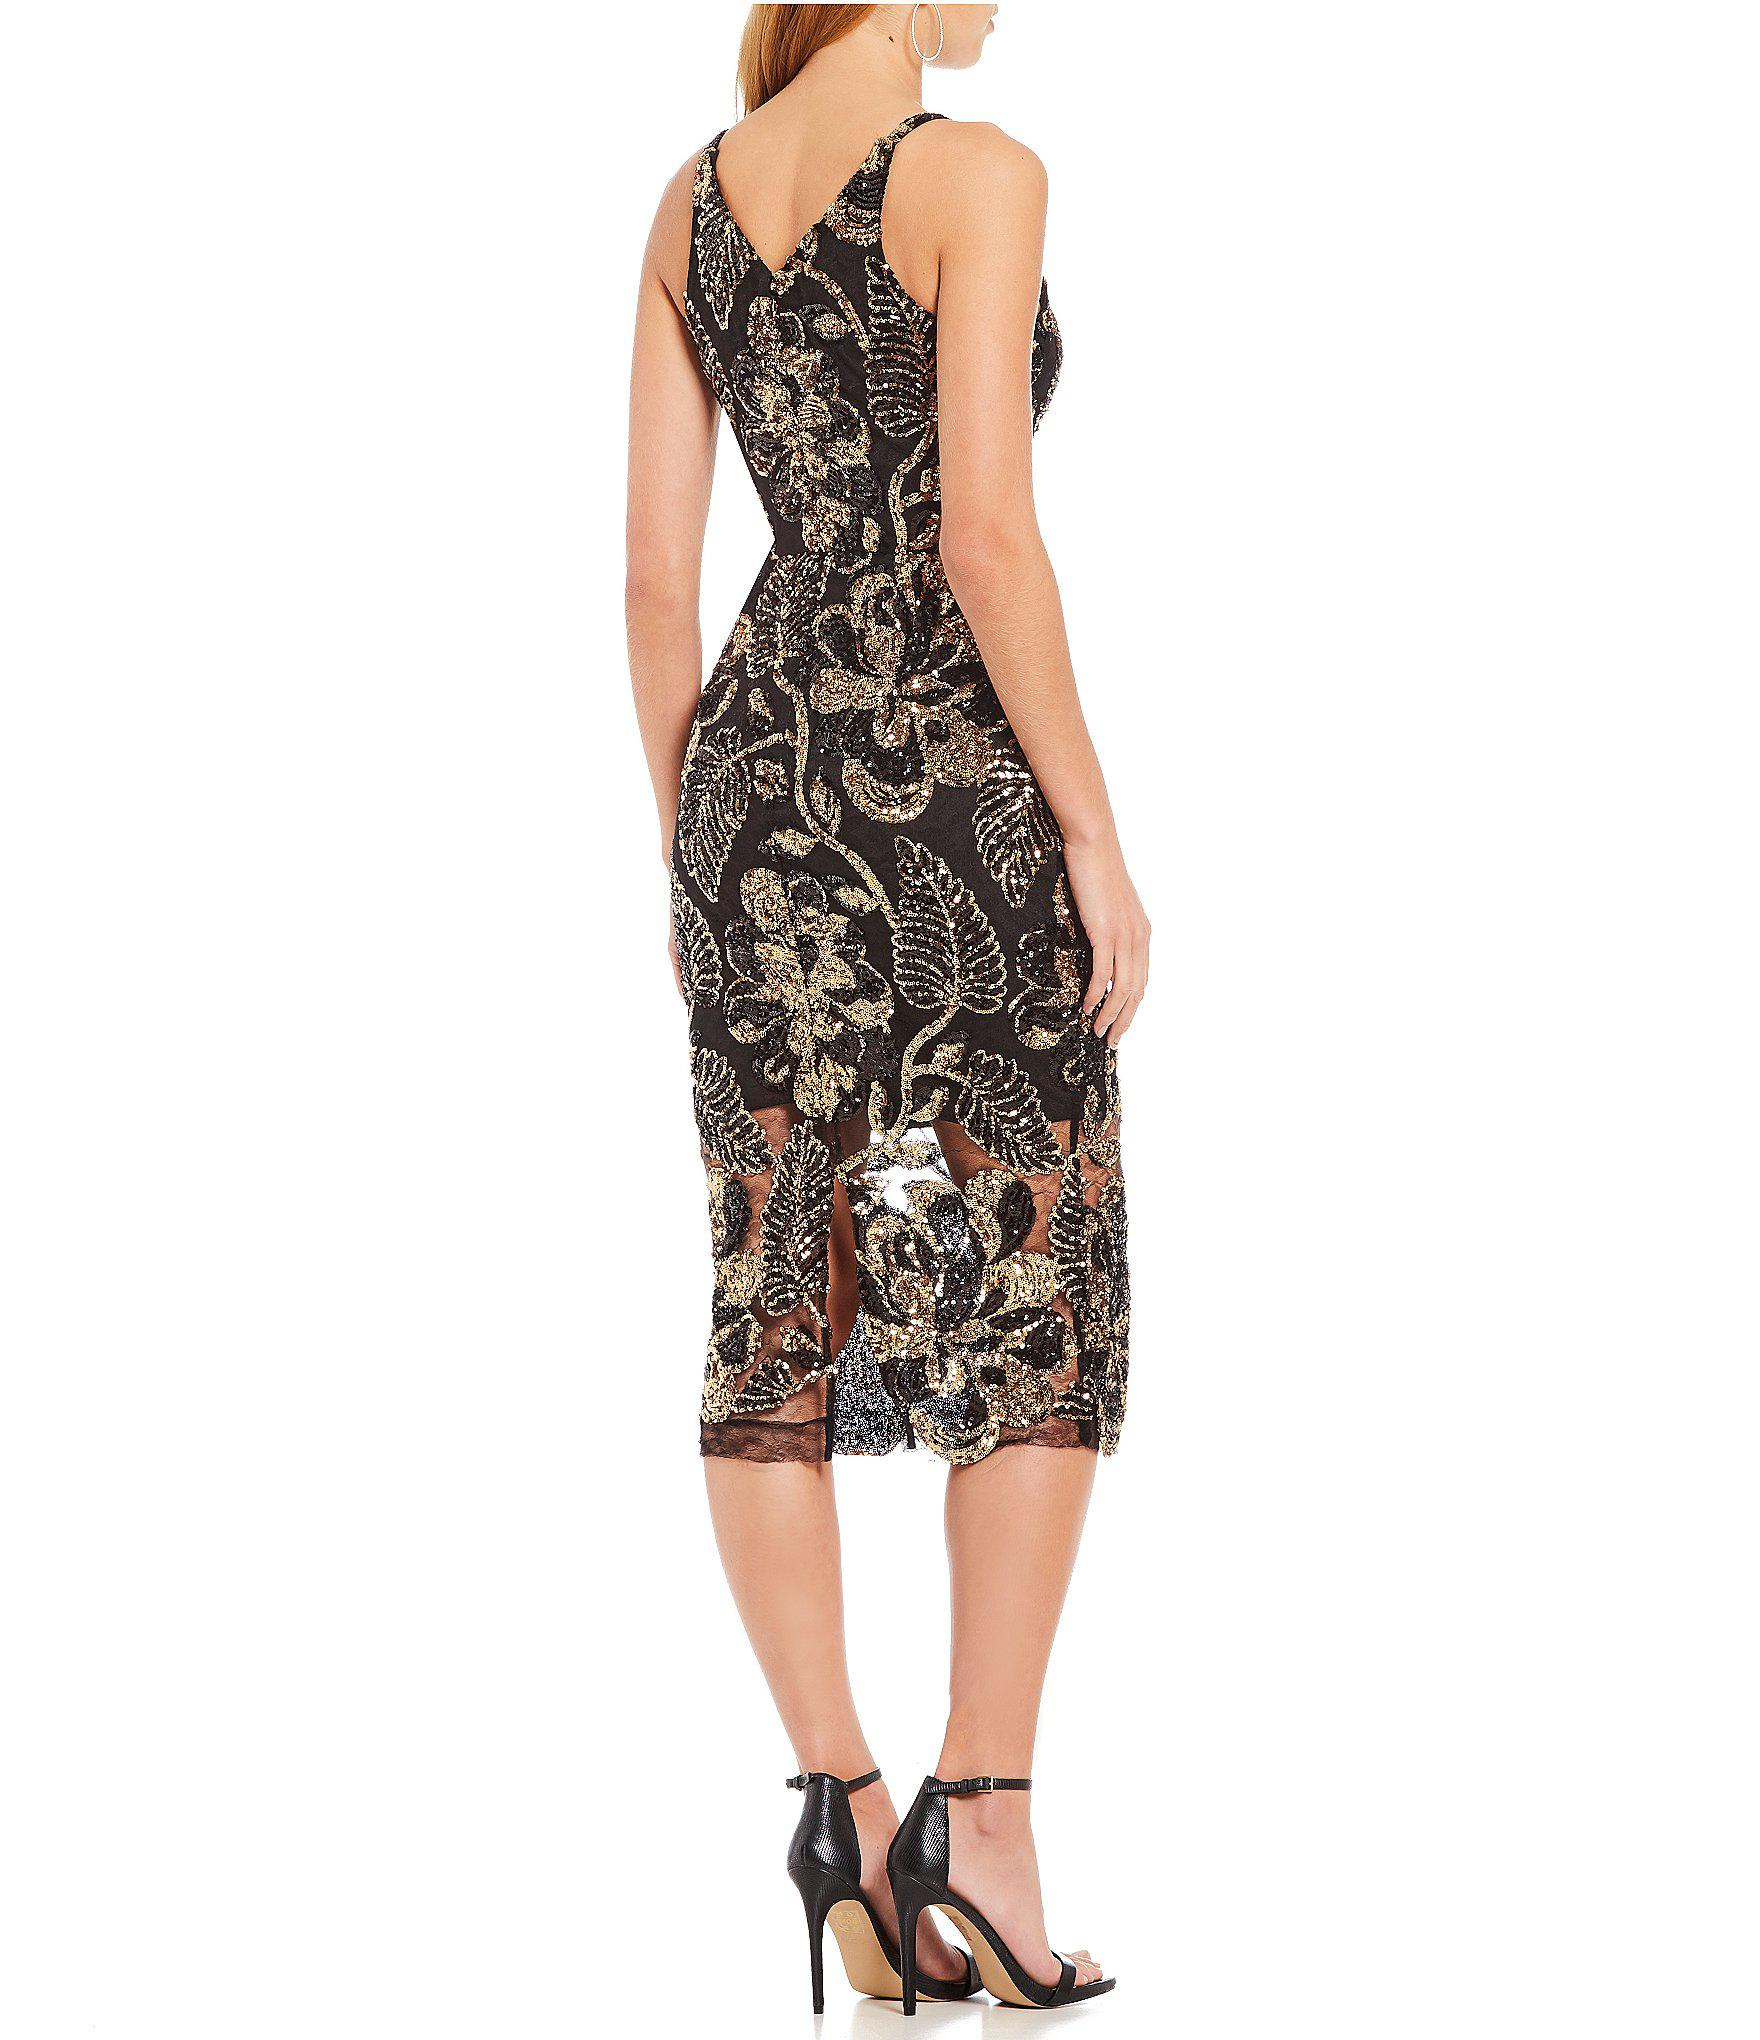 306fdb55 Dress the Population Margo Floral Sequin Midi Dress in Black - Lyst